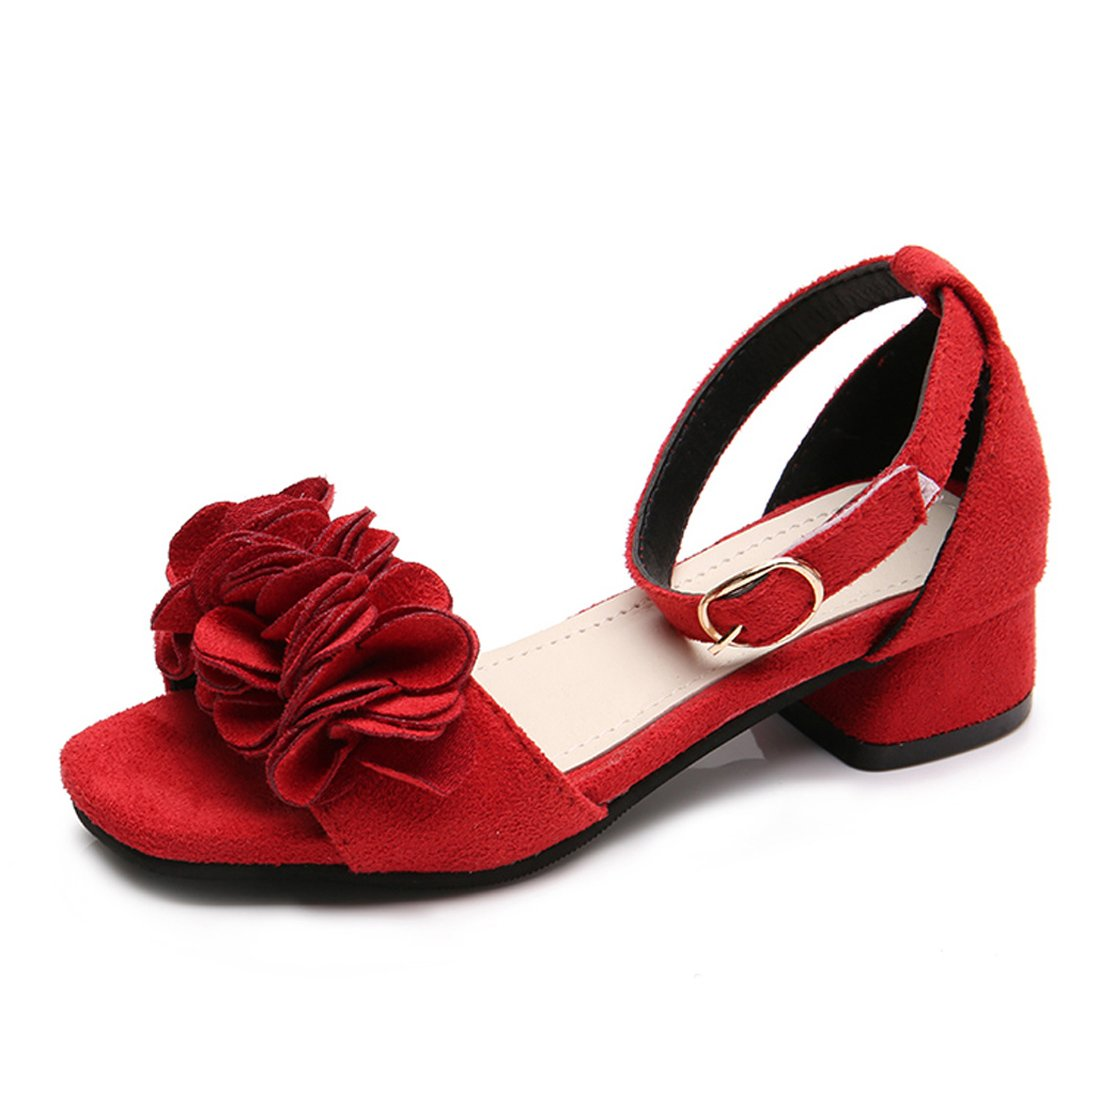 YIBLBOX Toddler Girls Kids Wedding Party Dress Shoes Summer Low Heel Sandals